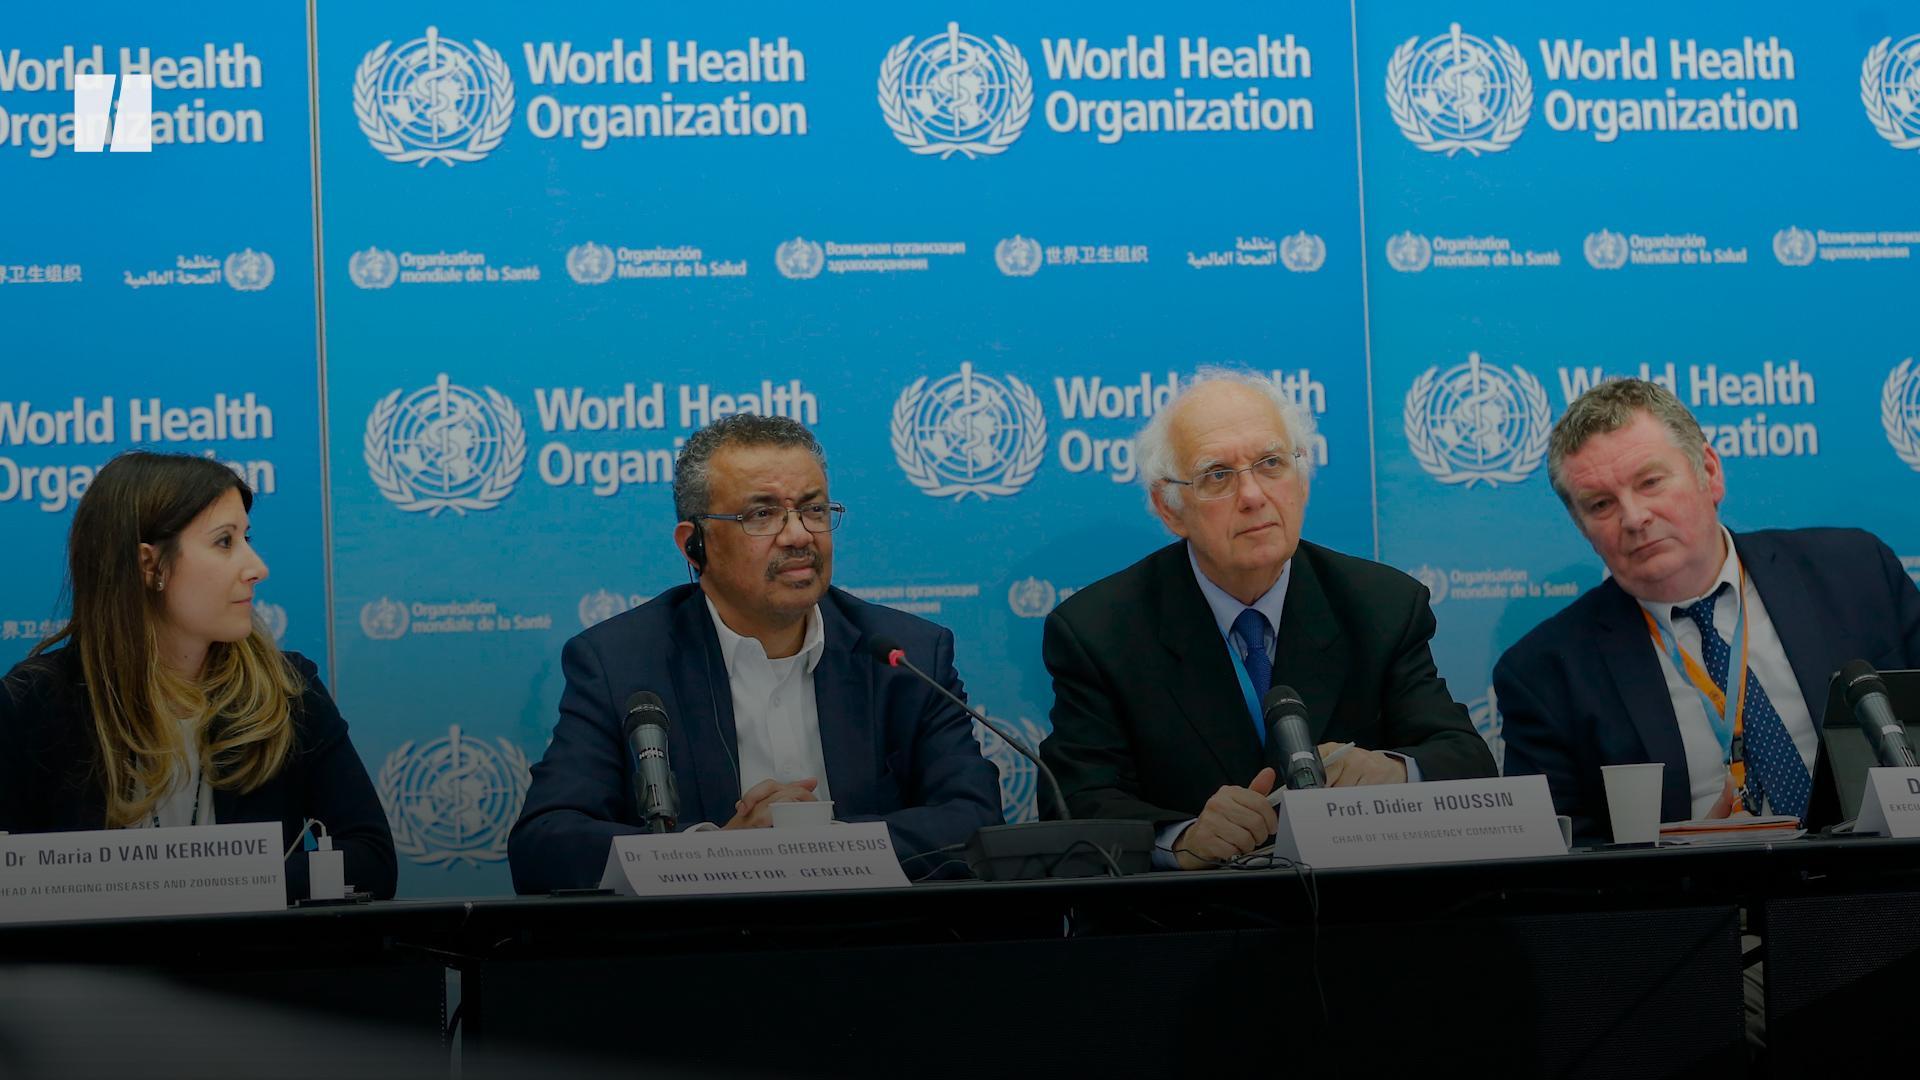 WHO Declares Global Health Emergency For Coronavirus As Cases Top 7,800